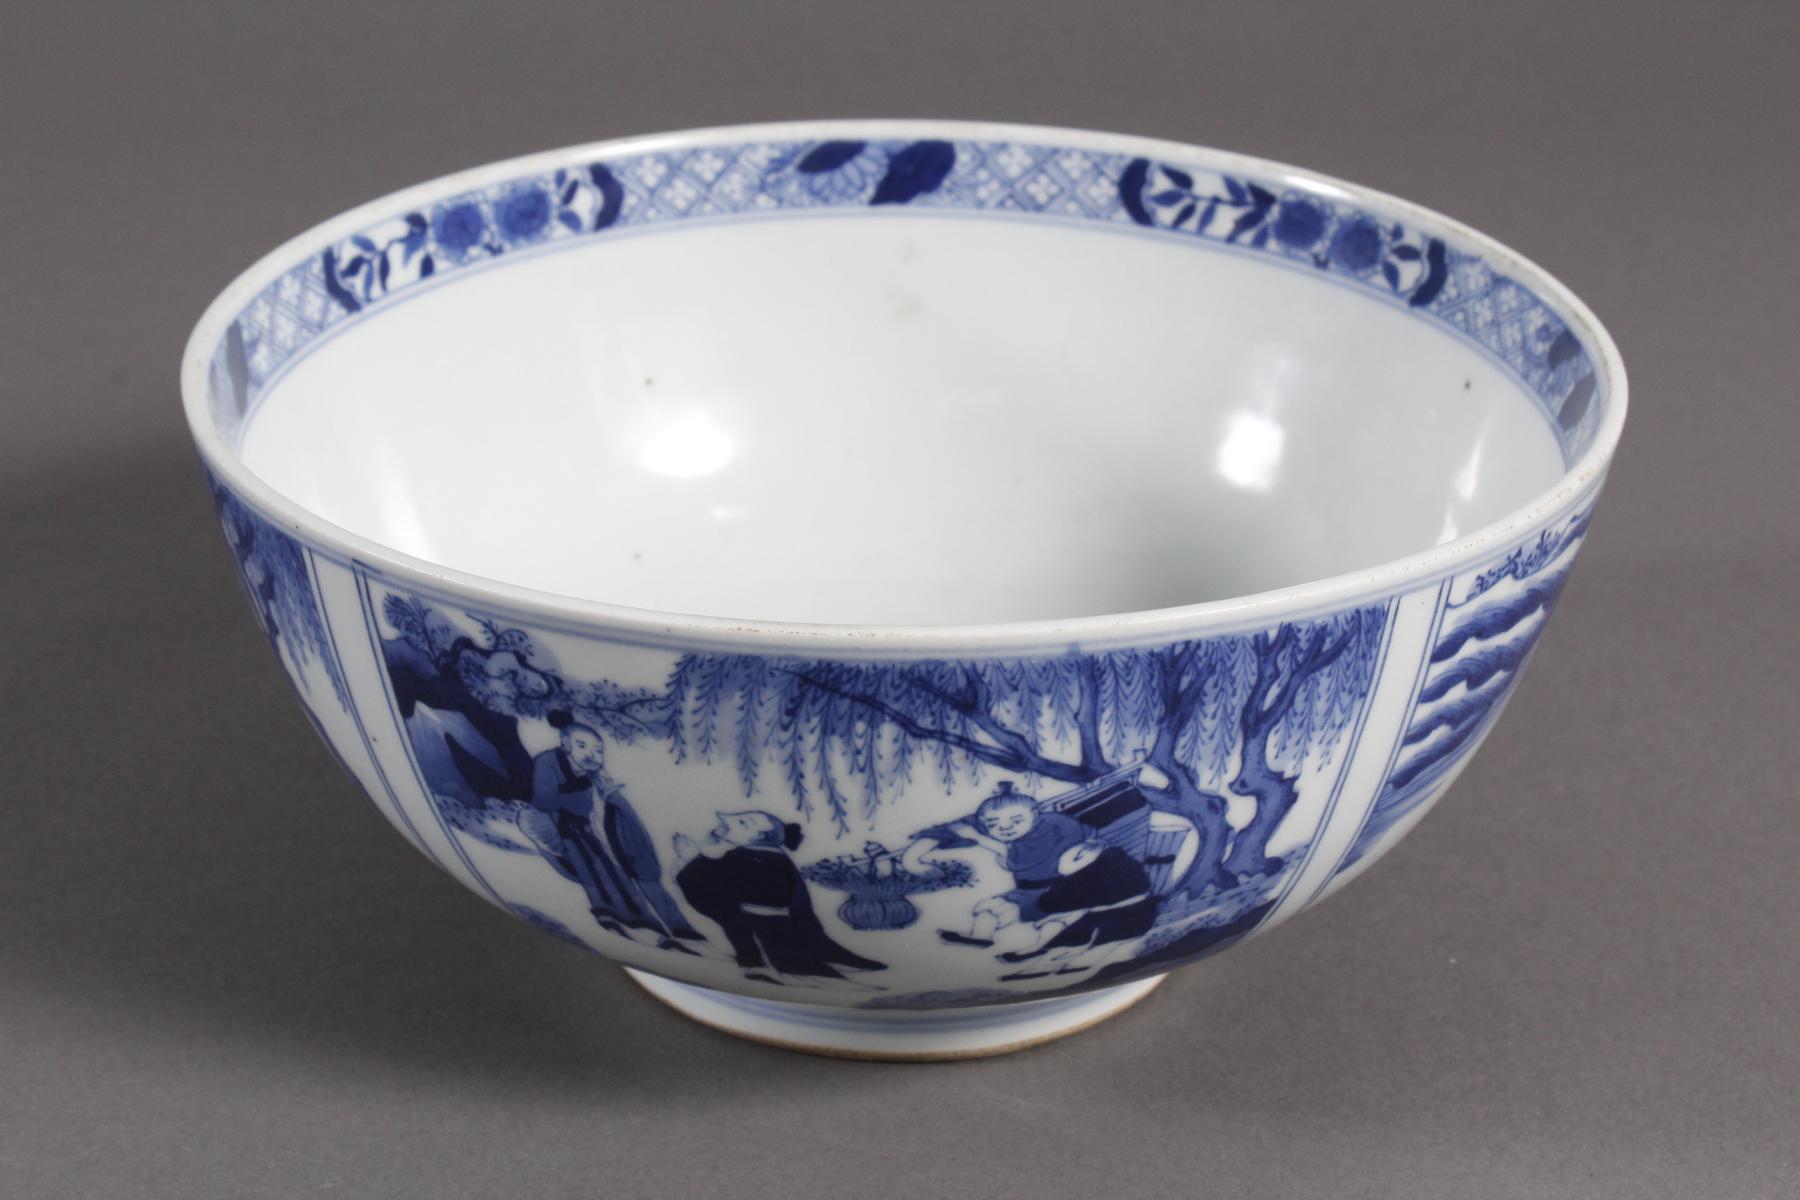 Porzellan-Kumme, China wohl 19. Jahrhundert